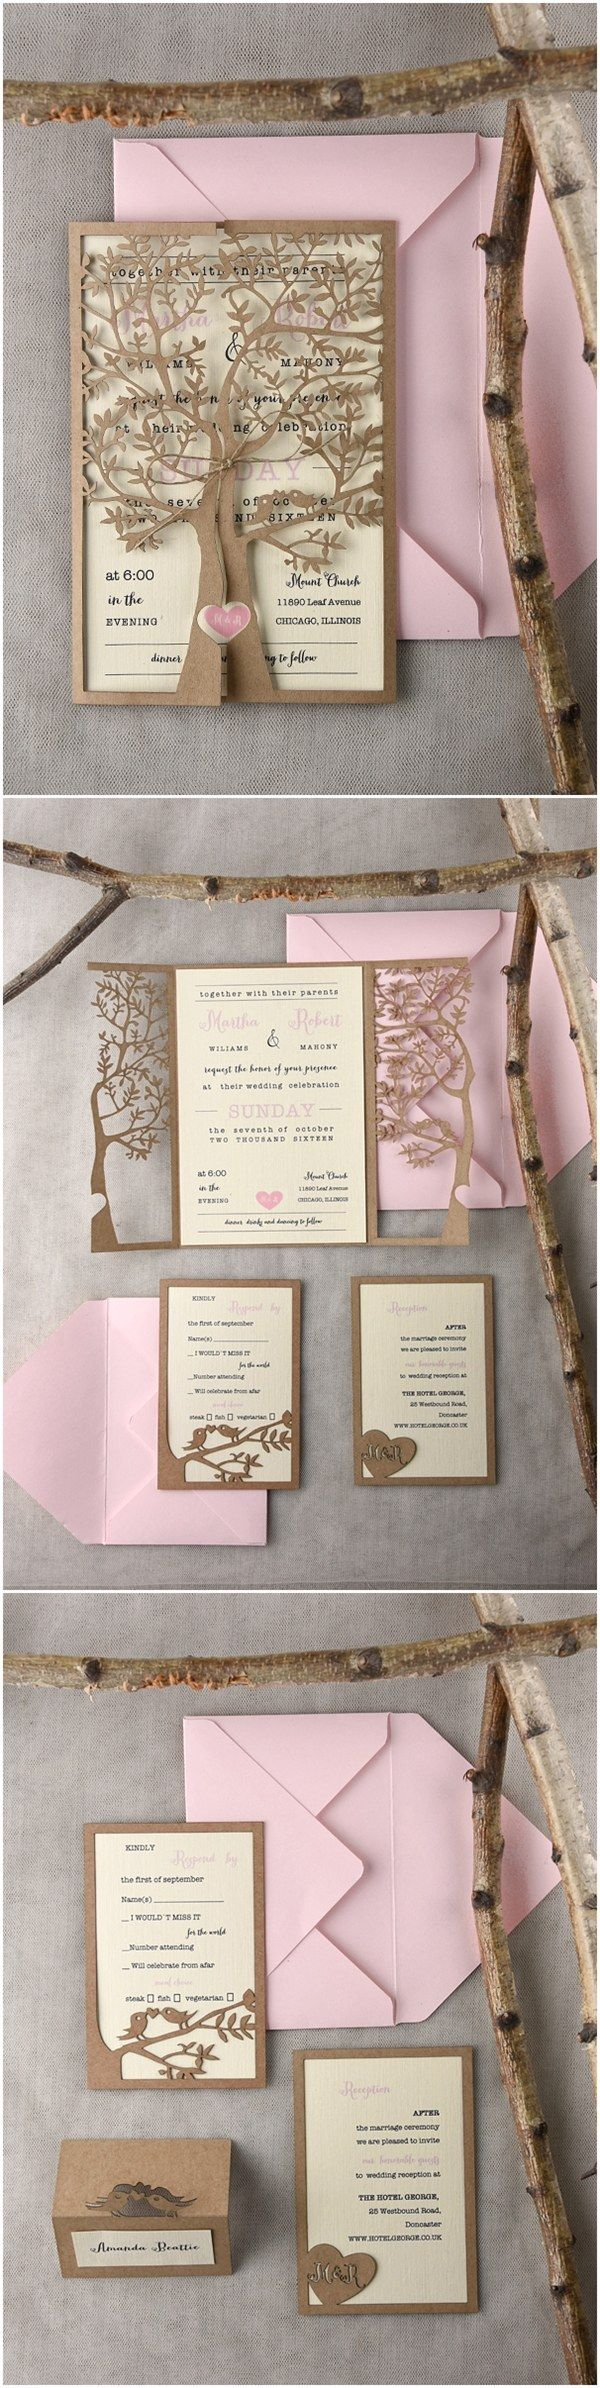 Wedding invitations lasercutengraved pink wedding invitations